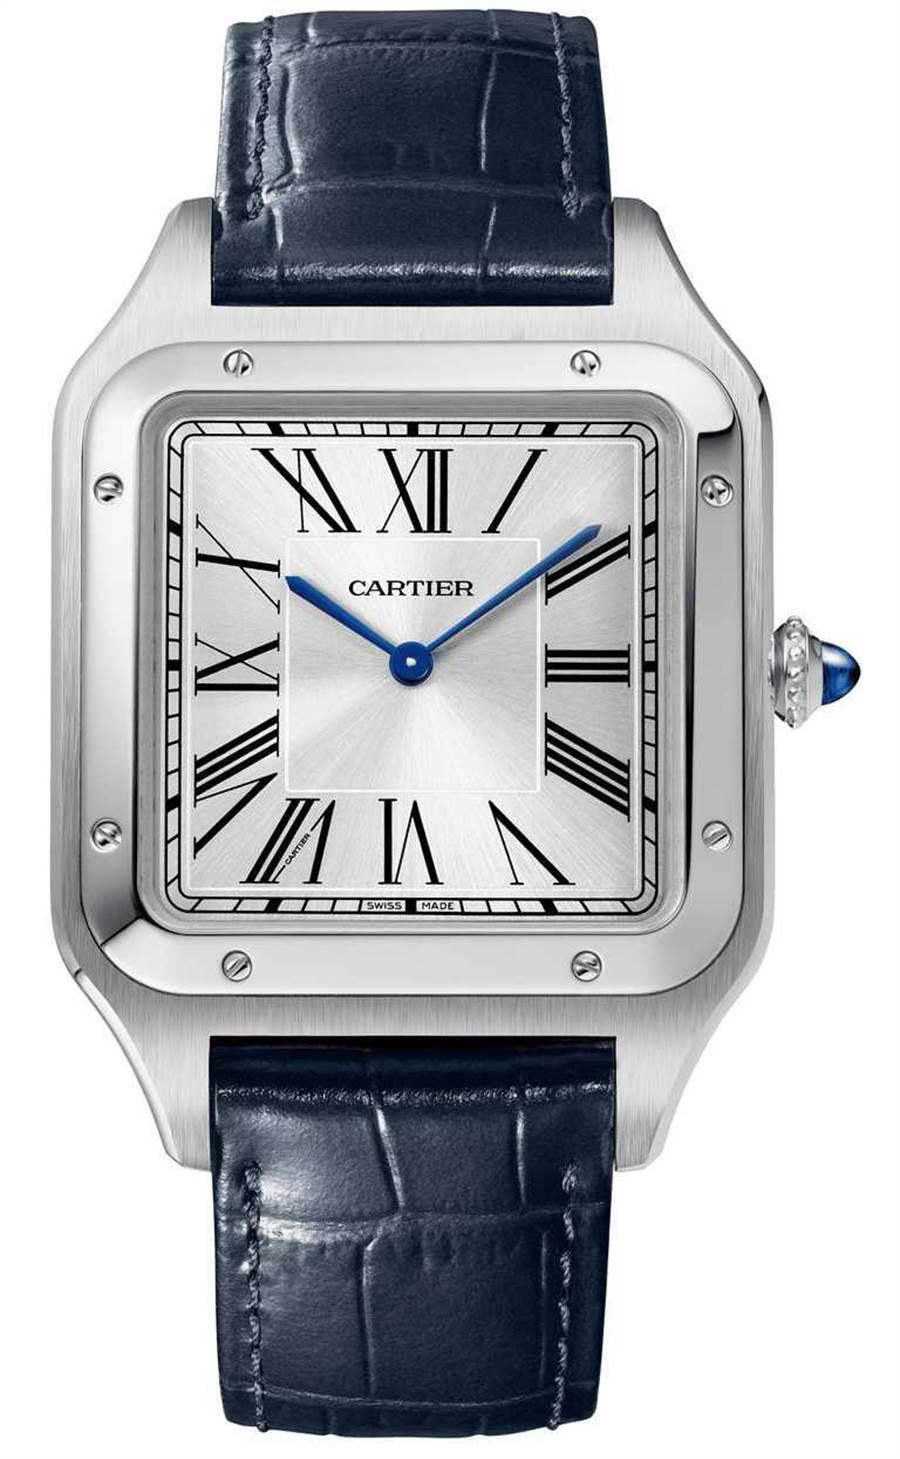 CARTIER「Santos-Dumont系列」超大型款腕表,精钢表壳,46.6mm╱180,000元。(图╱CARTIER提供)